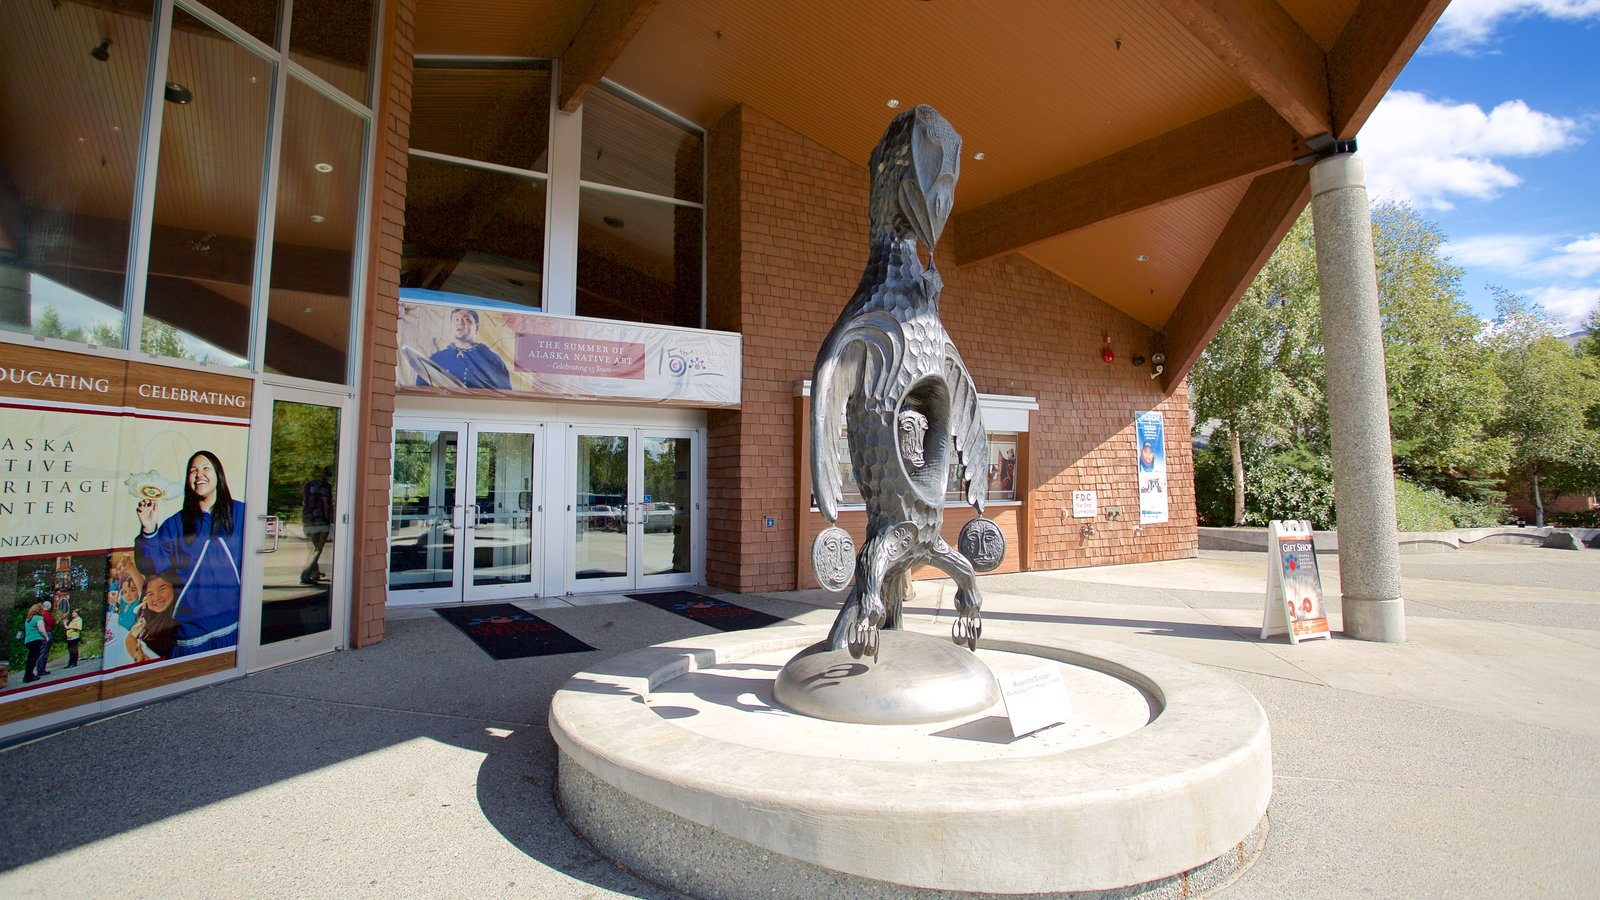 Alaska Native Heritage Center featuring a statue or sculpture